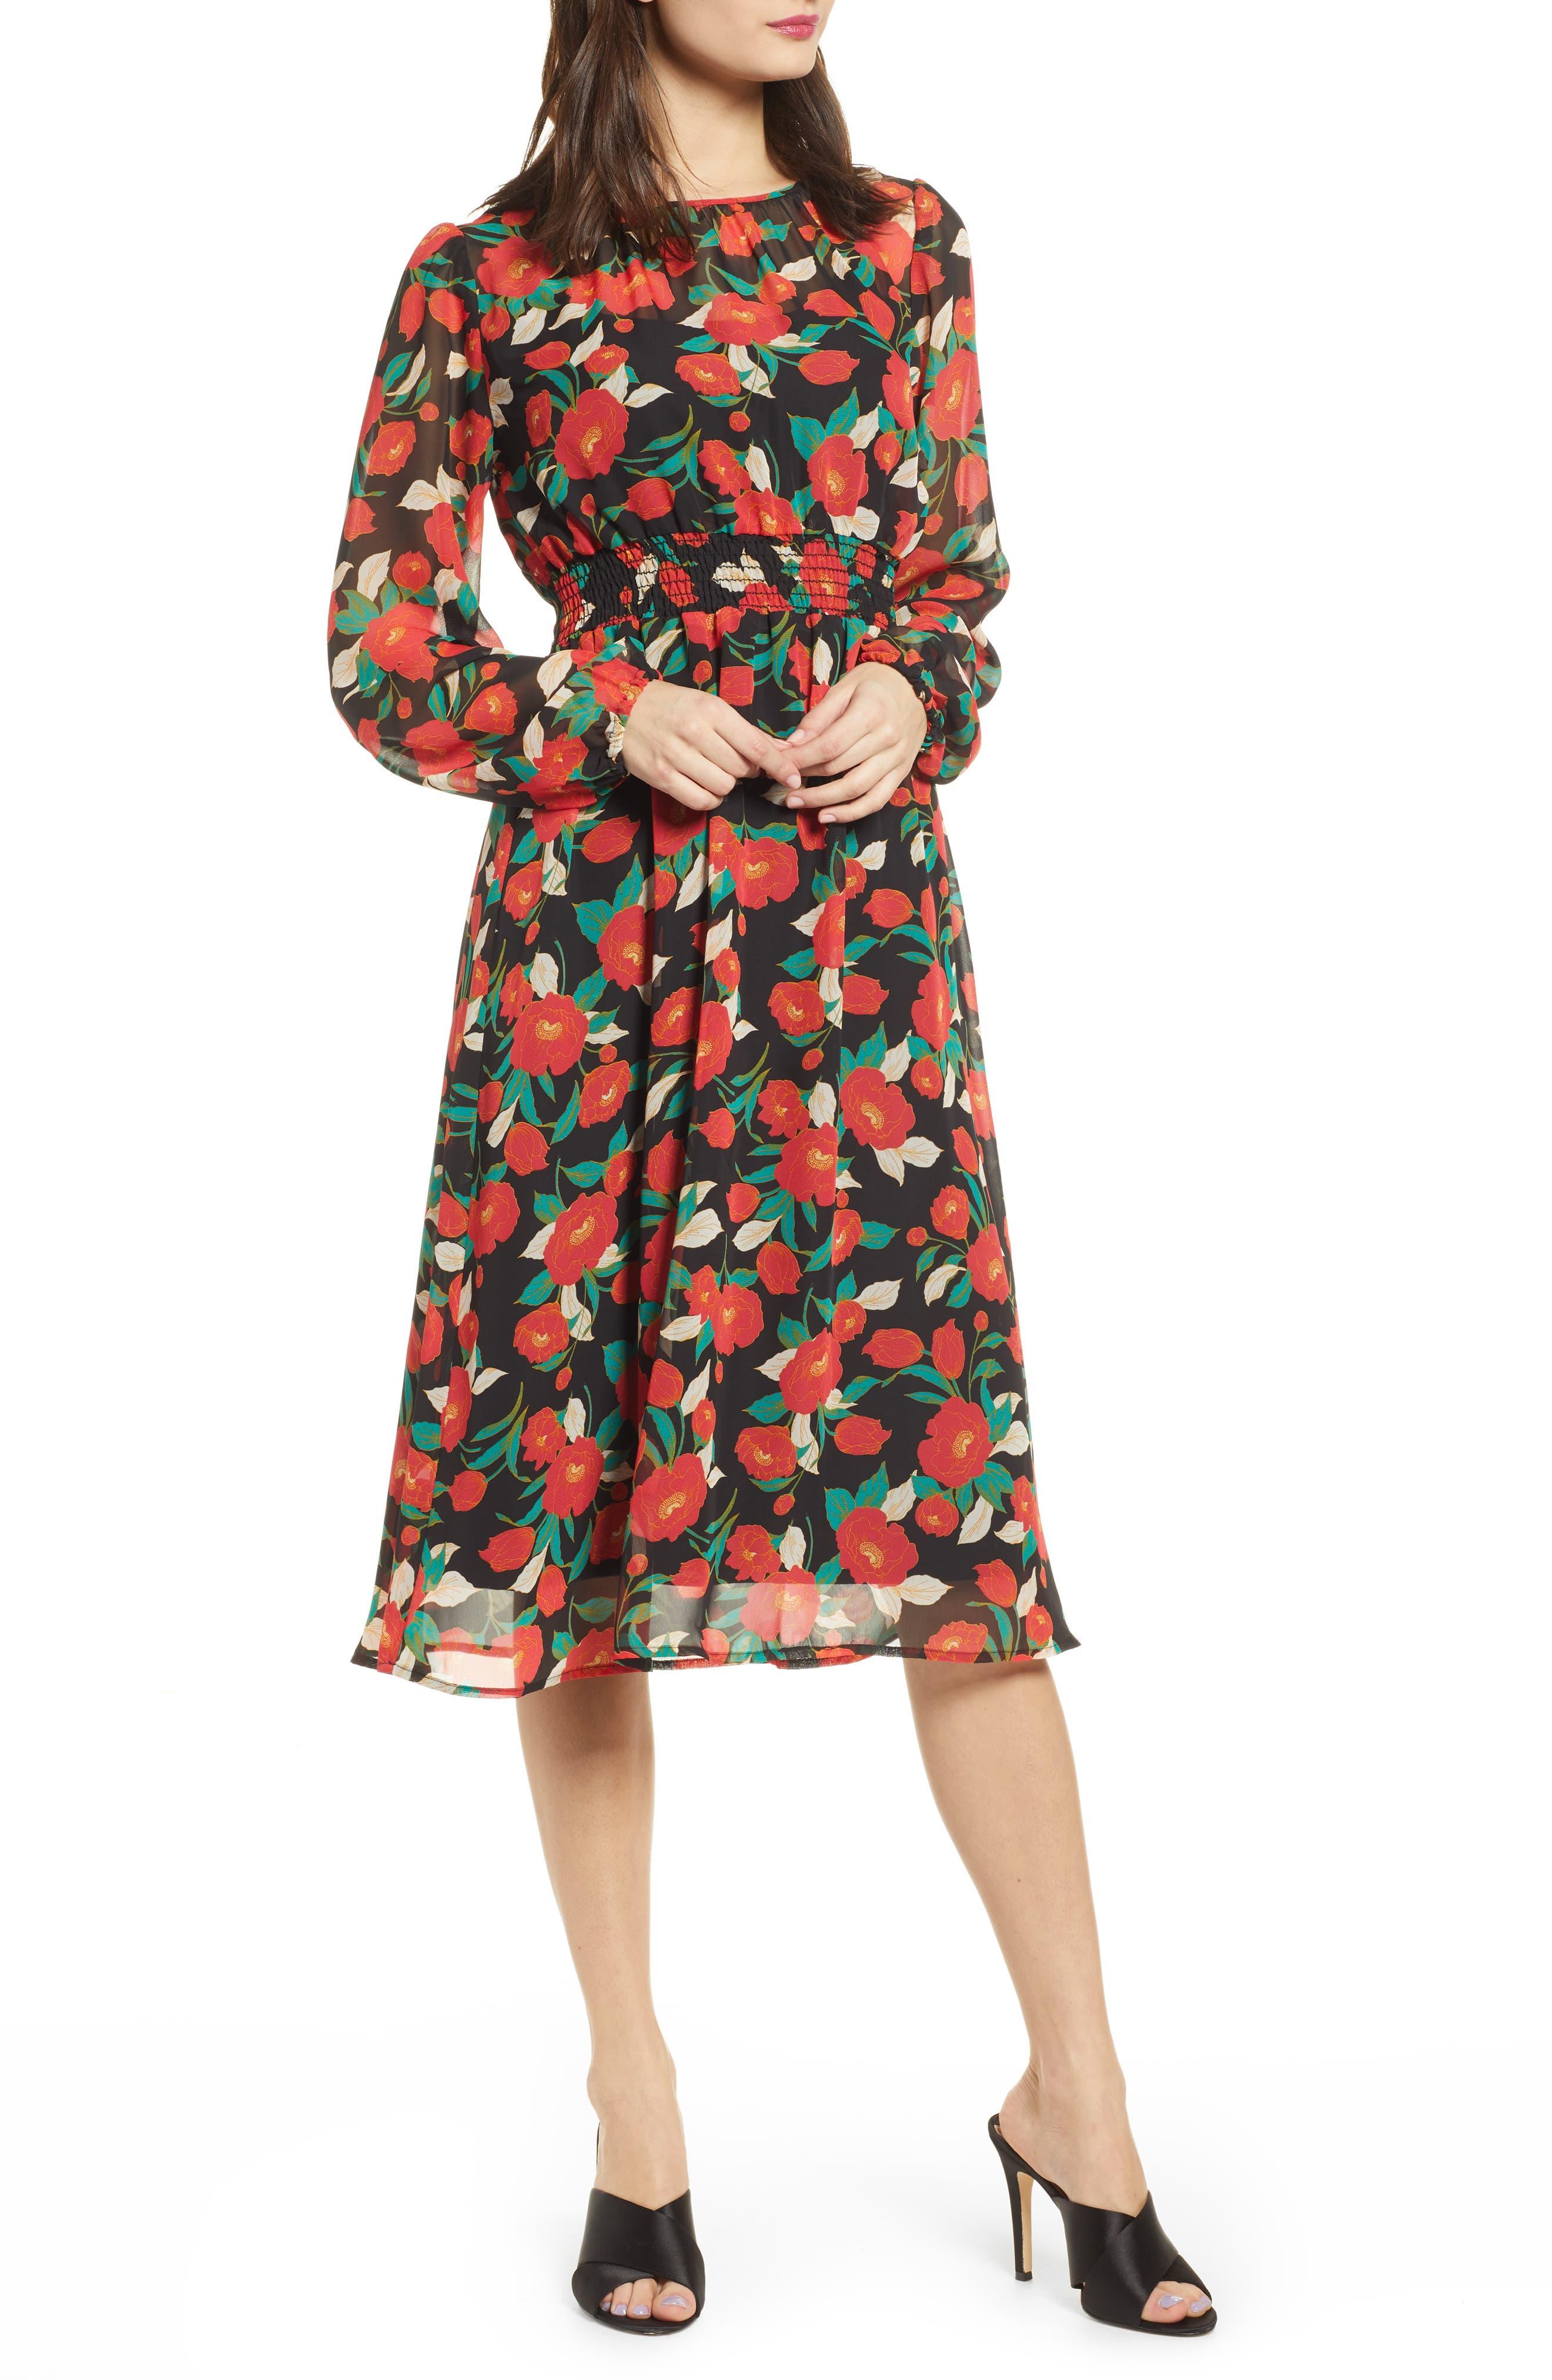 Leith Long Sleeve Chiffon Dress, Black